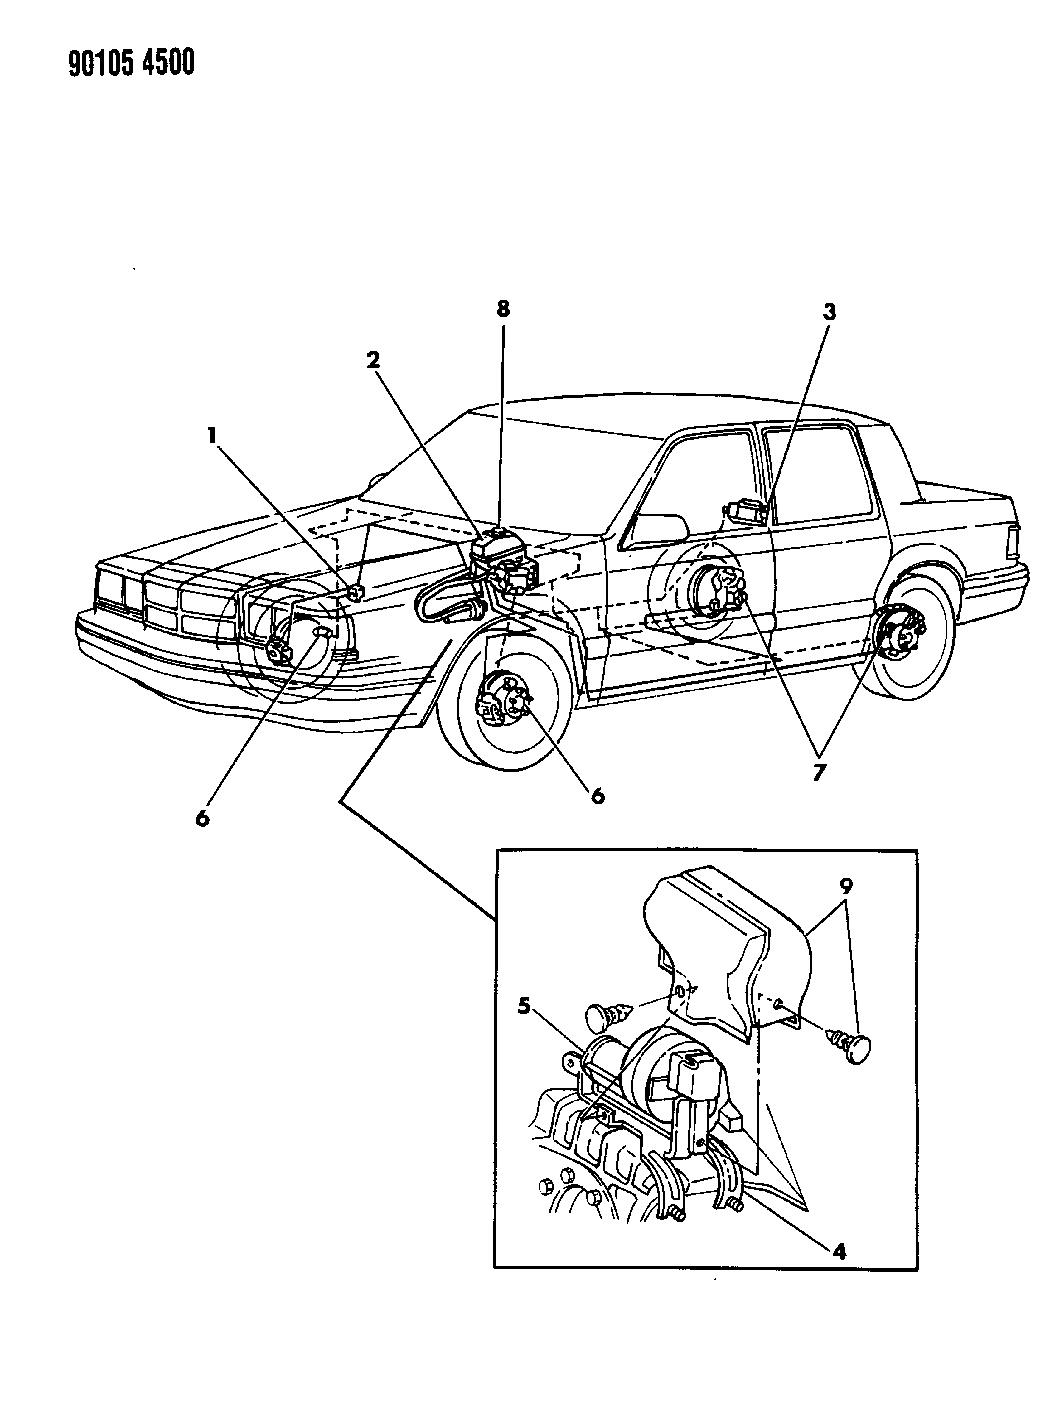 1990 Dodge Dynasty Anti-Lock Brake System - Thumbnail 1